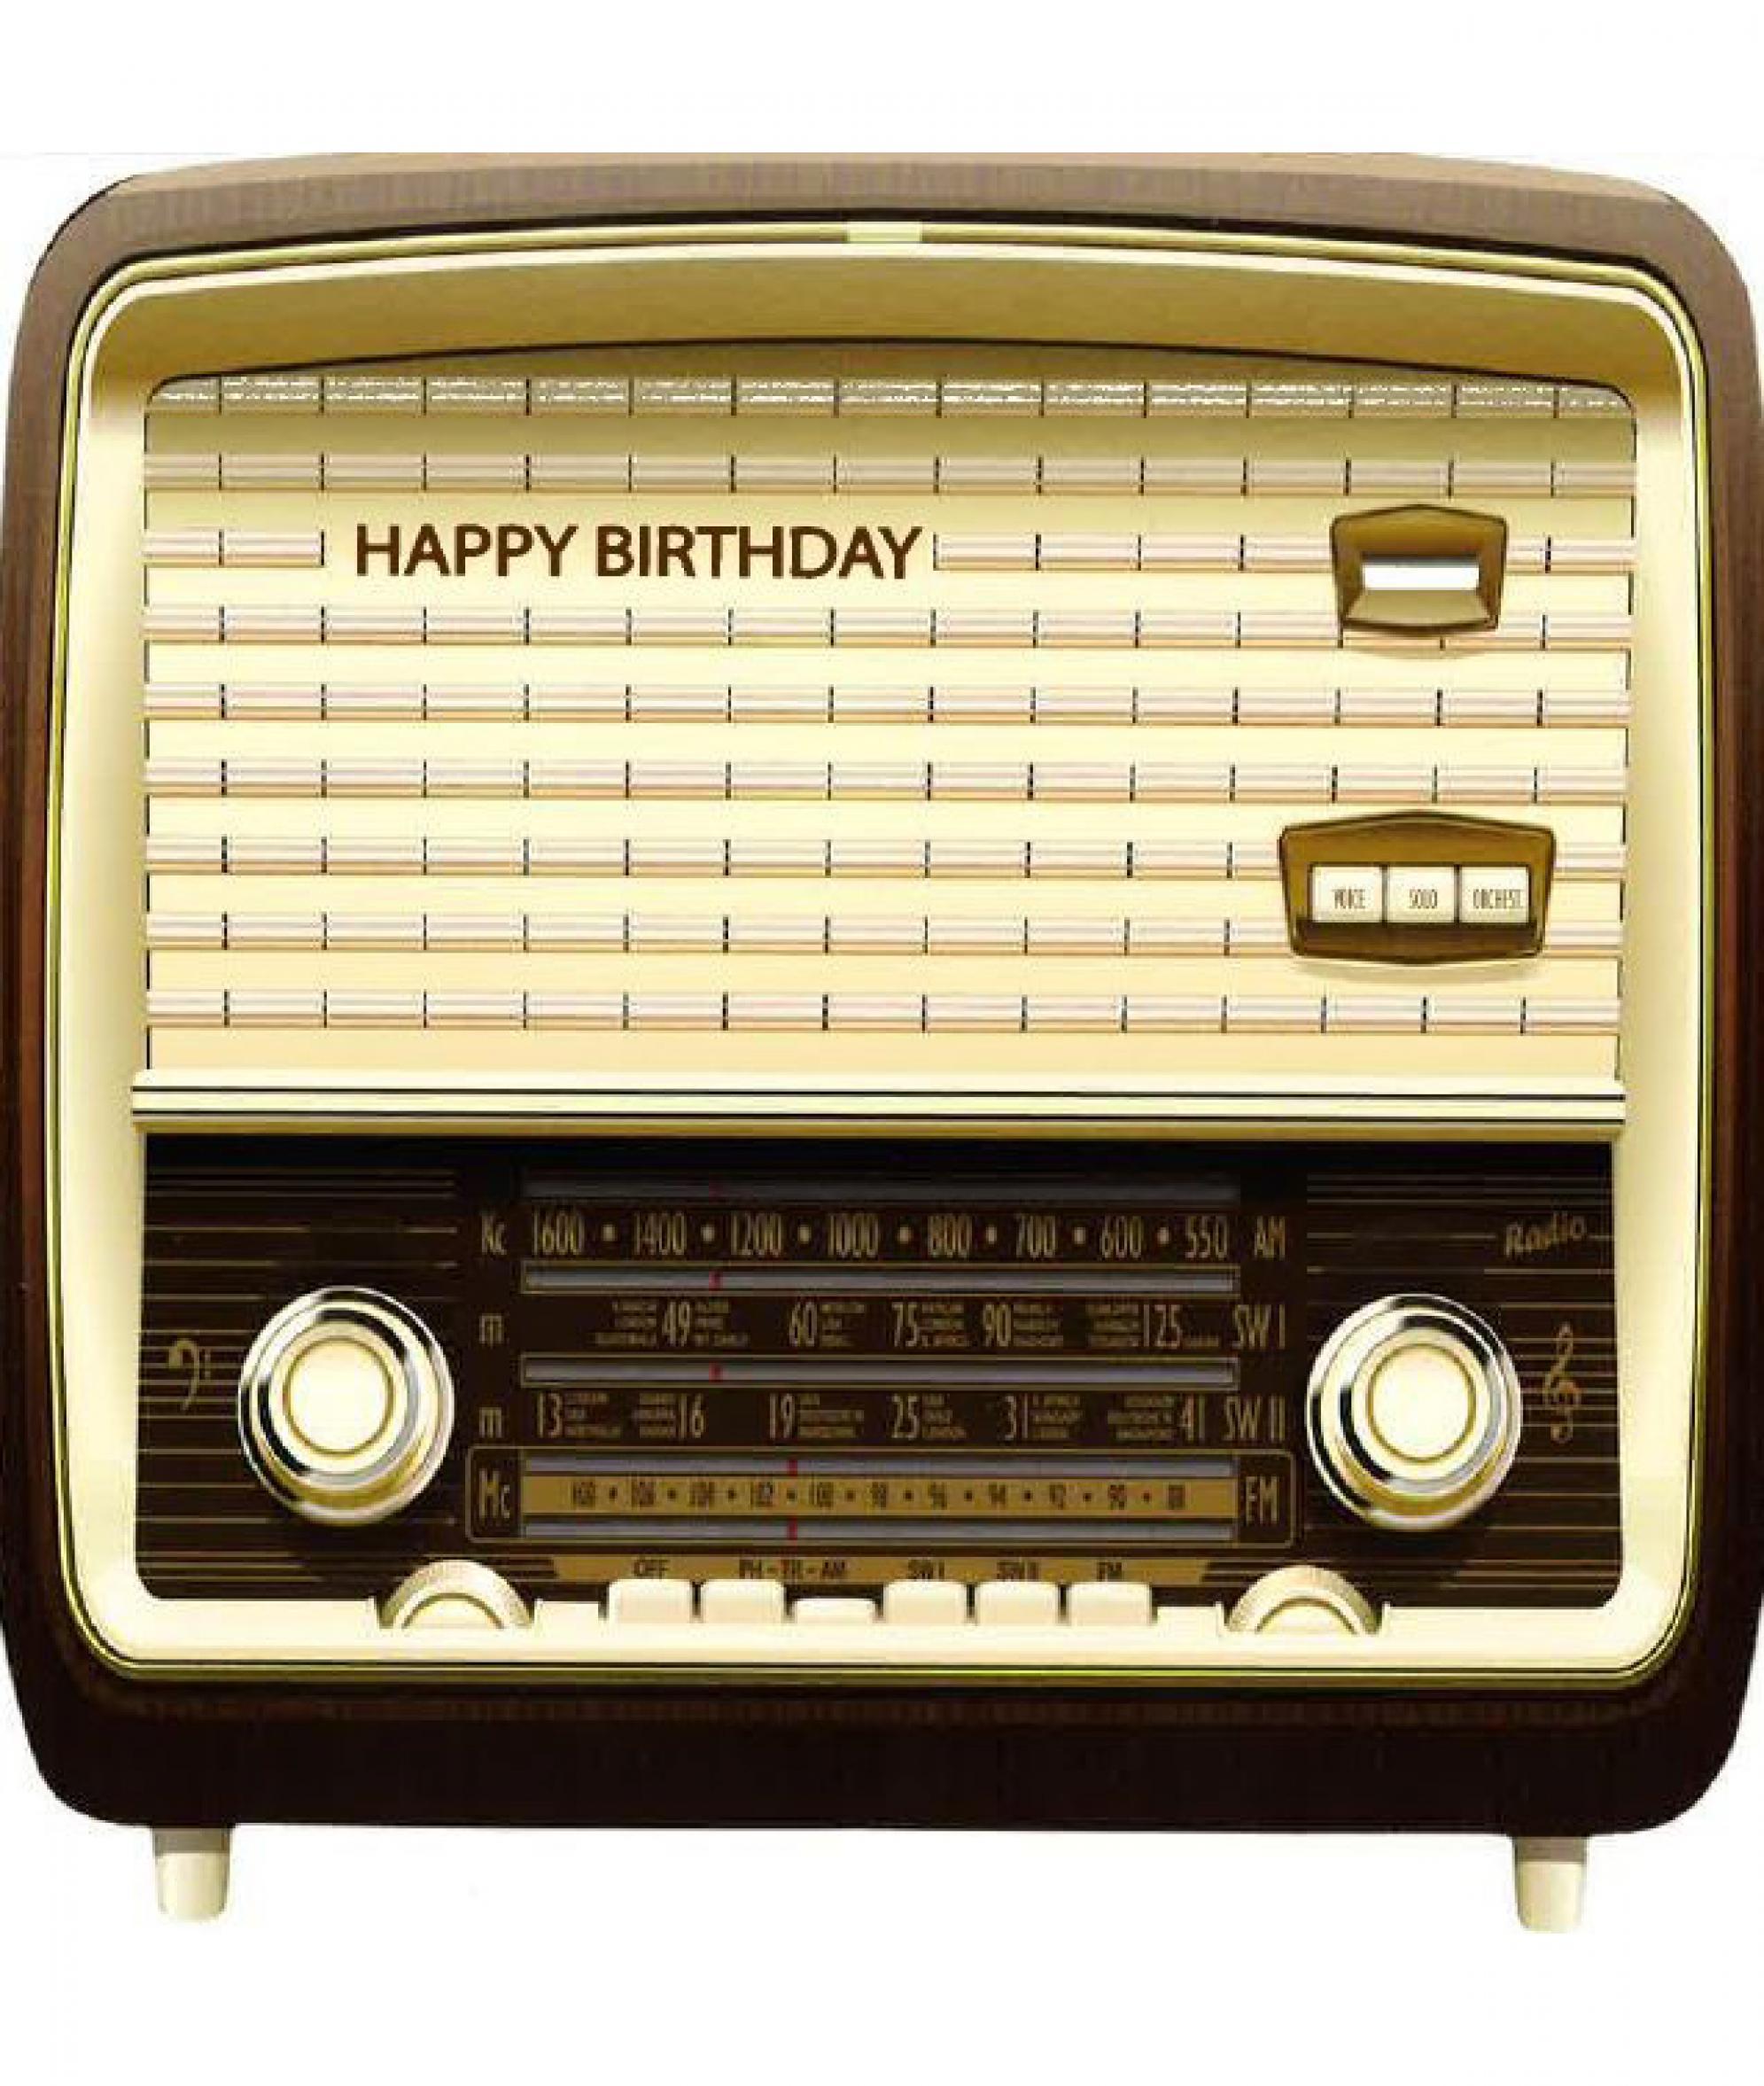 Old fashion radio Happy birthday card | Cancer Research UK Online Shop